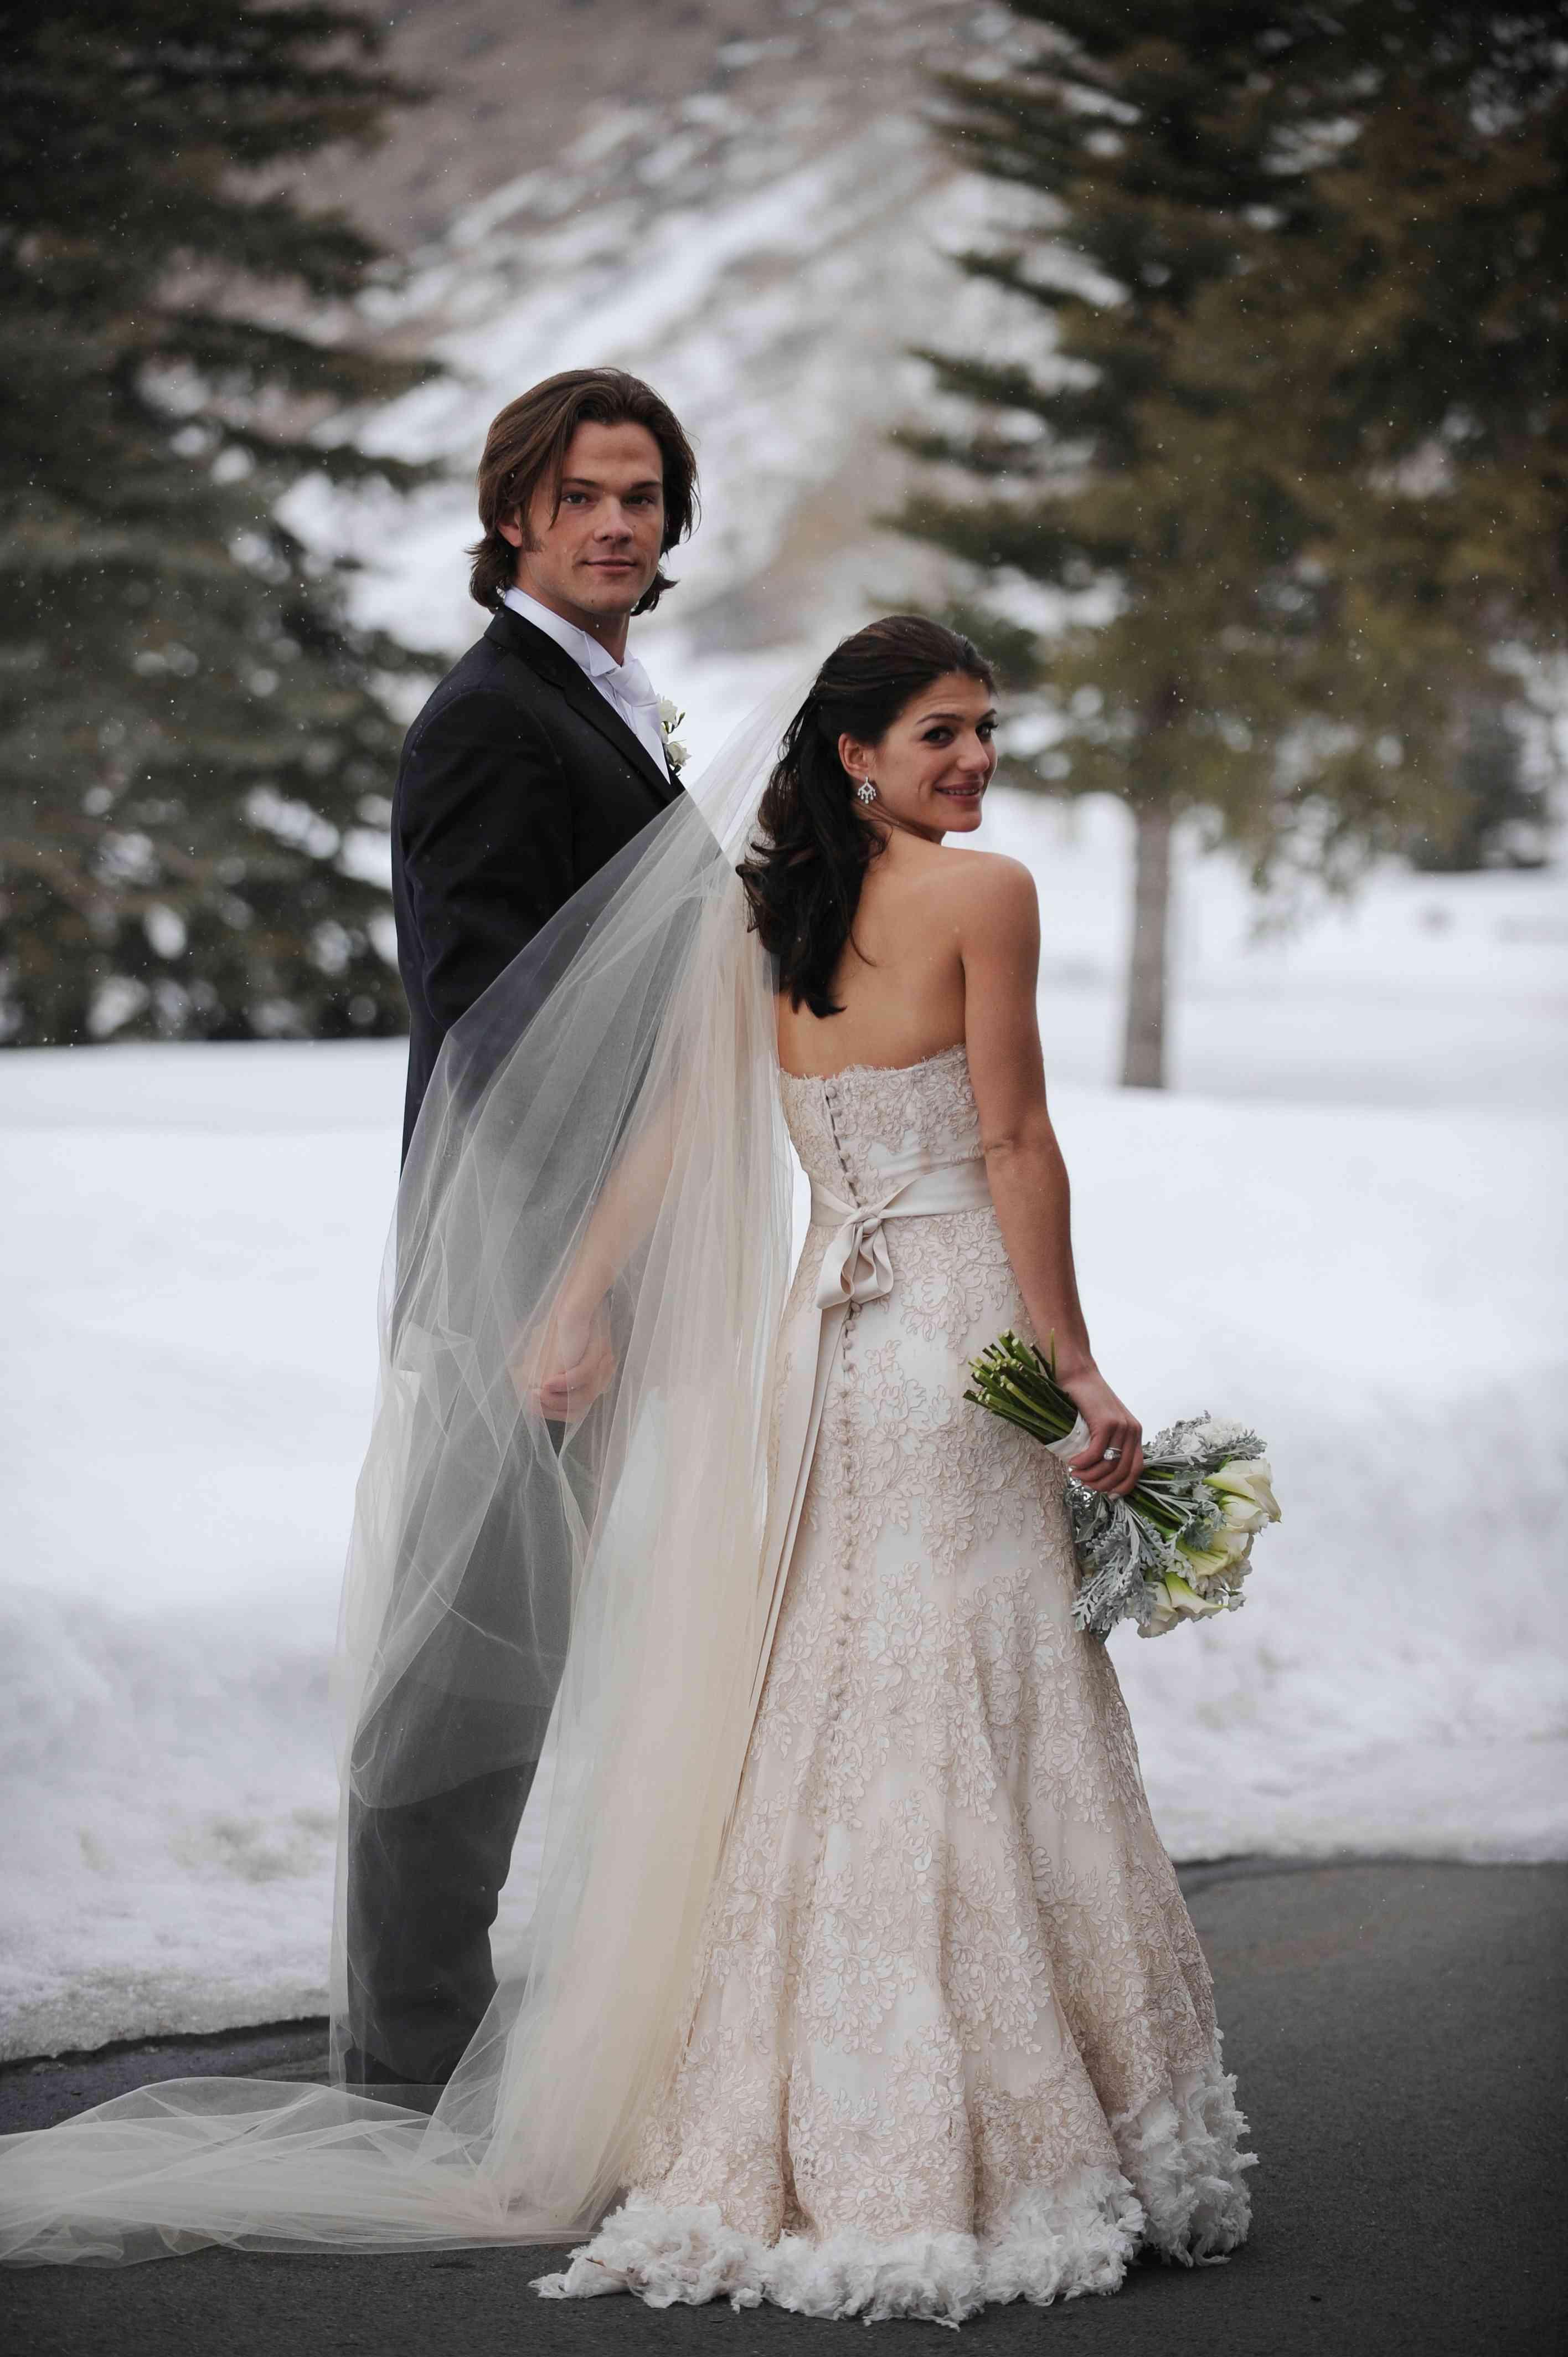 e2cf9e5020b 10 of the Most Viewed Celebrity Weddings on InsideWeddings.com in ...